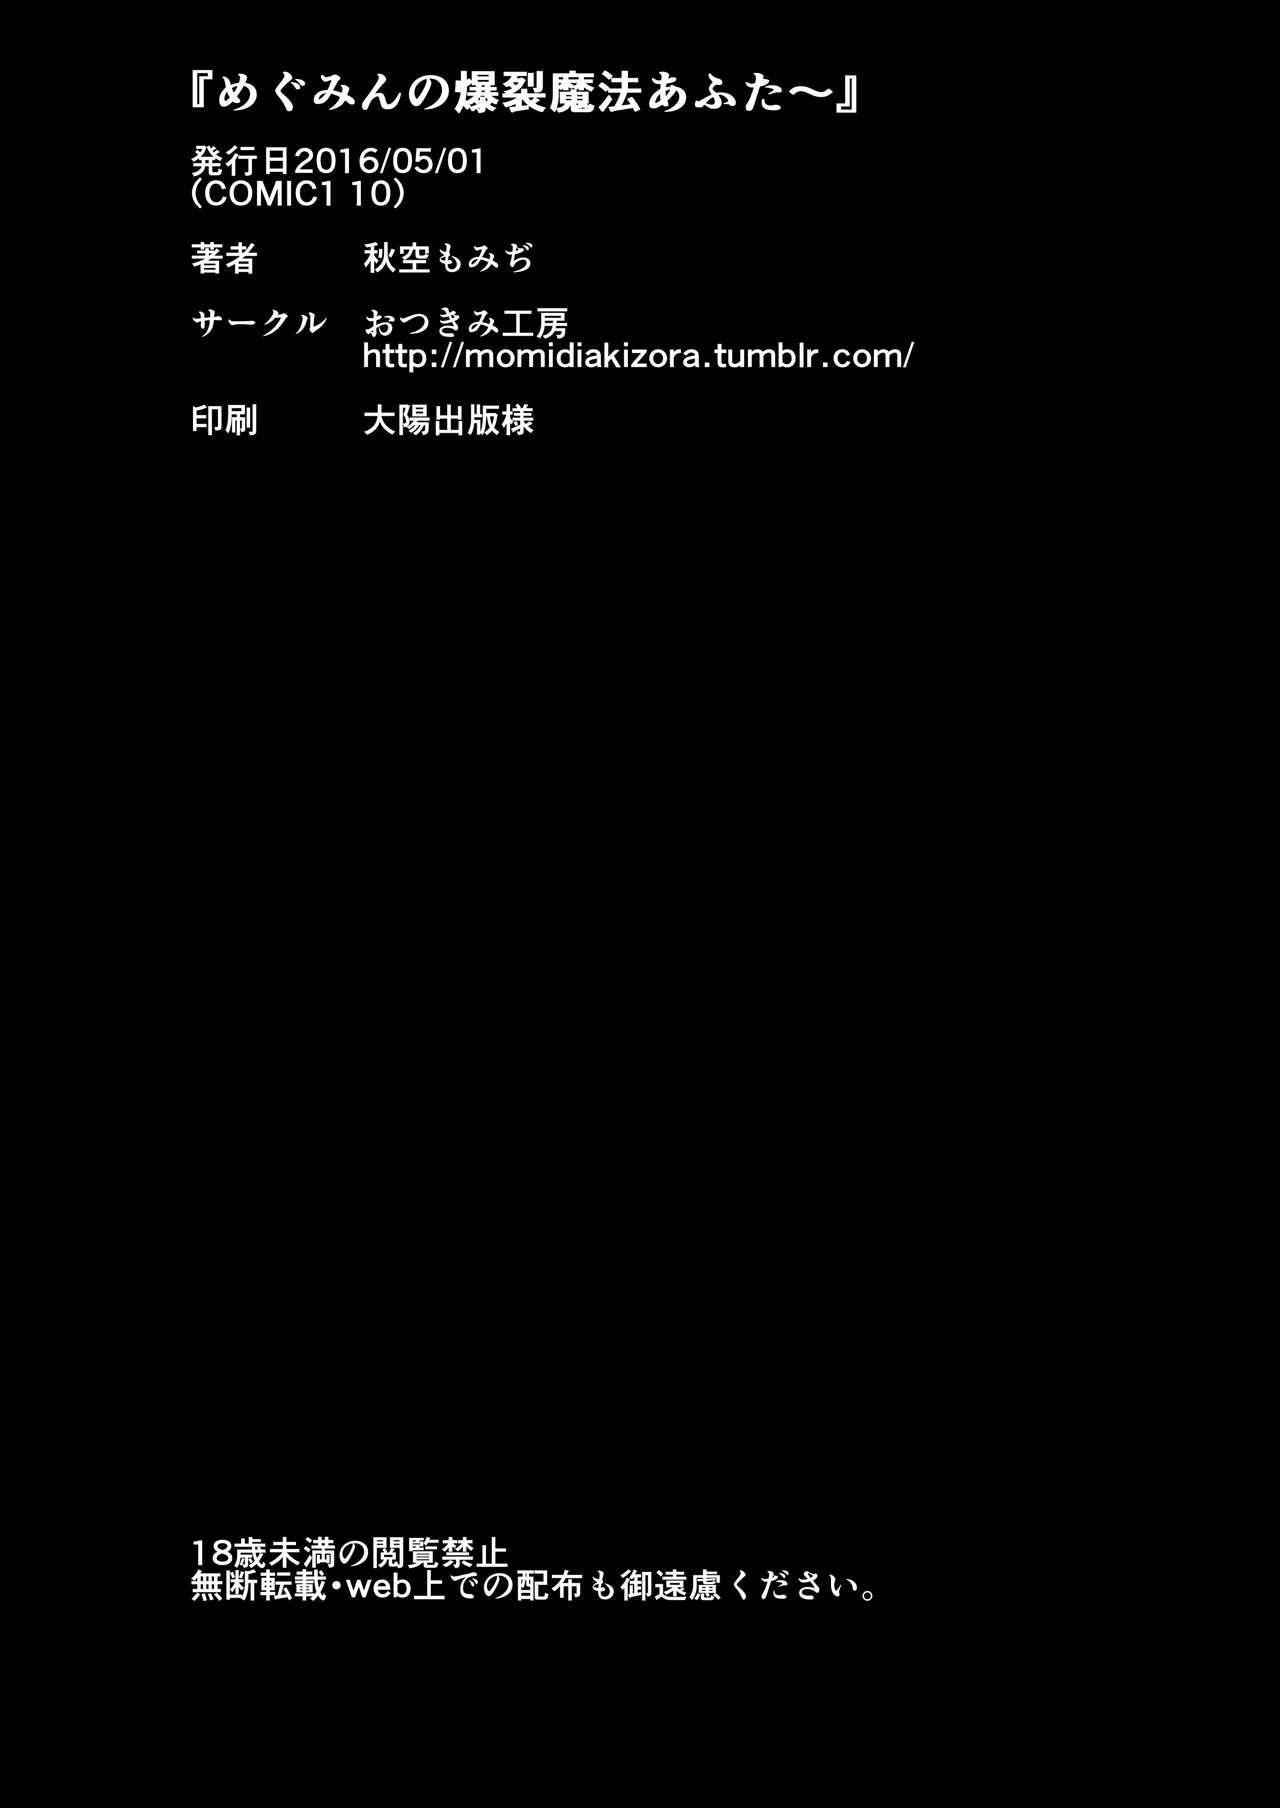 Megumin no Bakuretsu Mahou After 21